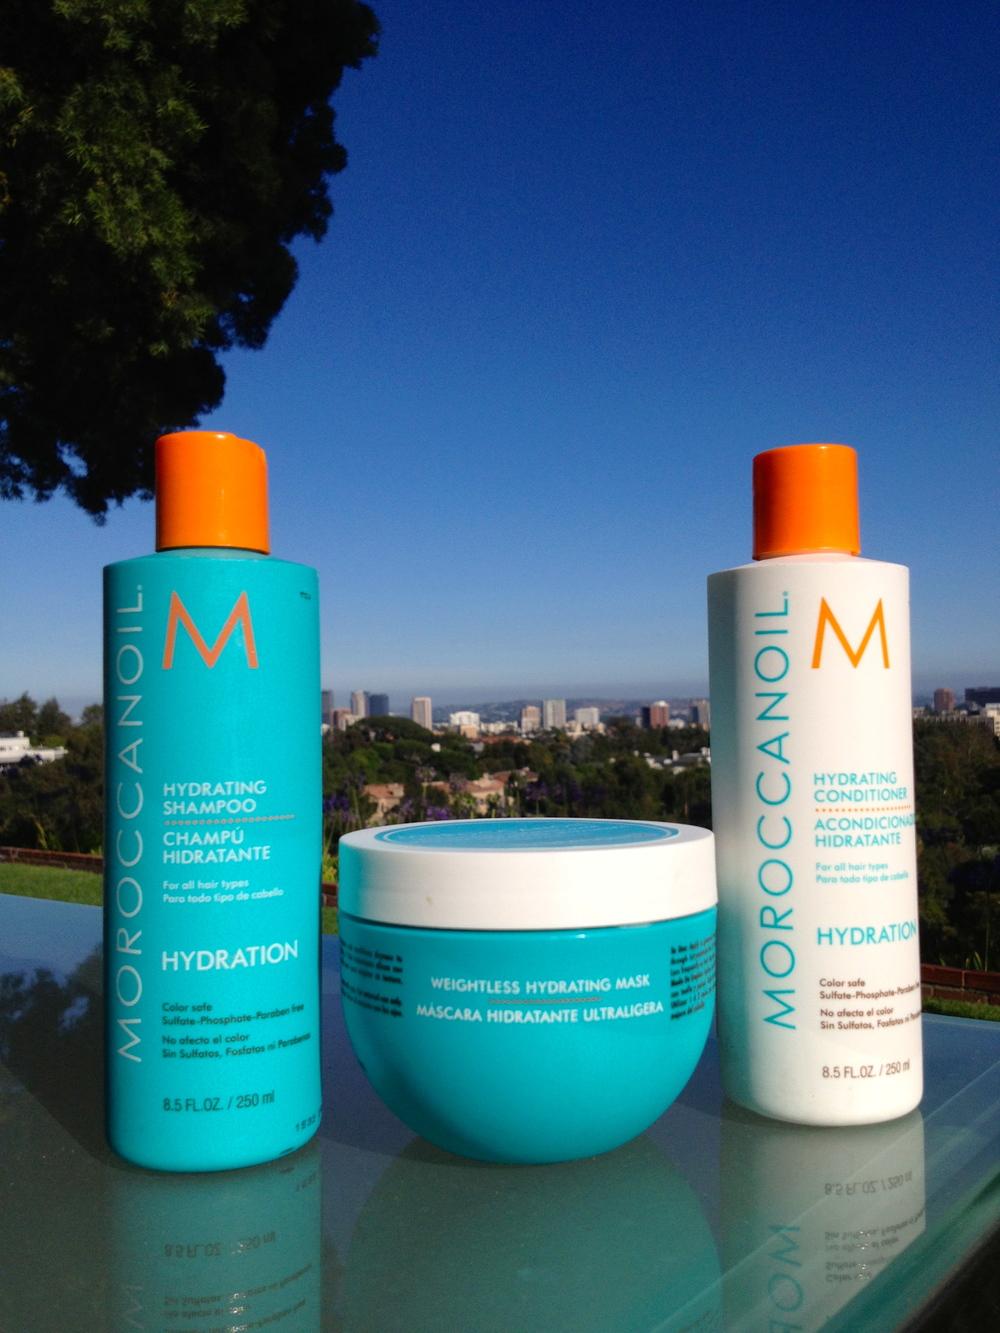 Moroccanoil Hydrating Shampoo$42.00     Moroccanoil Hydrating Conditioner$42.00   Moroccanoil Weightless Hydrating Mask $32.00